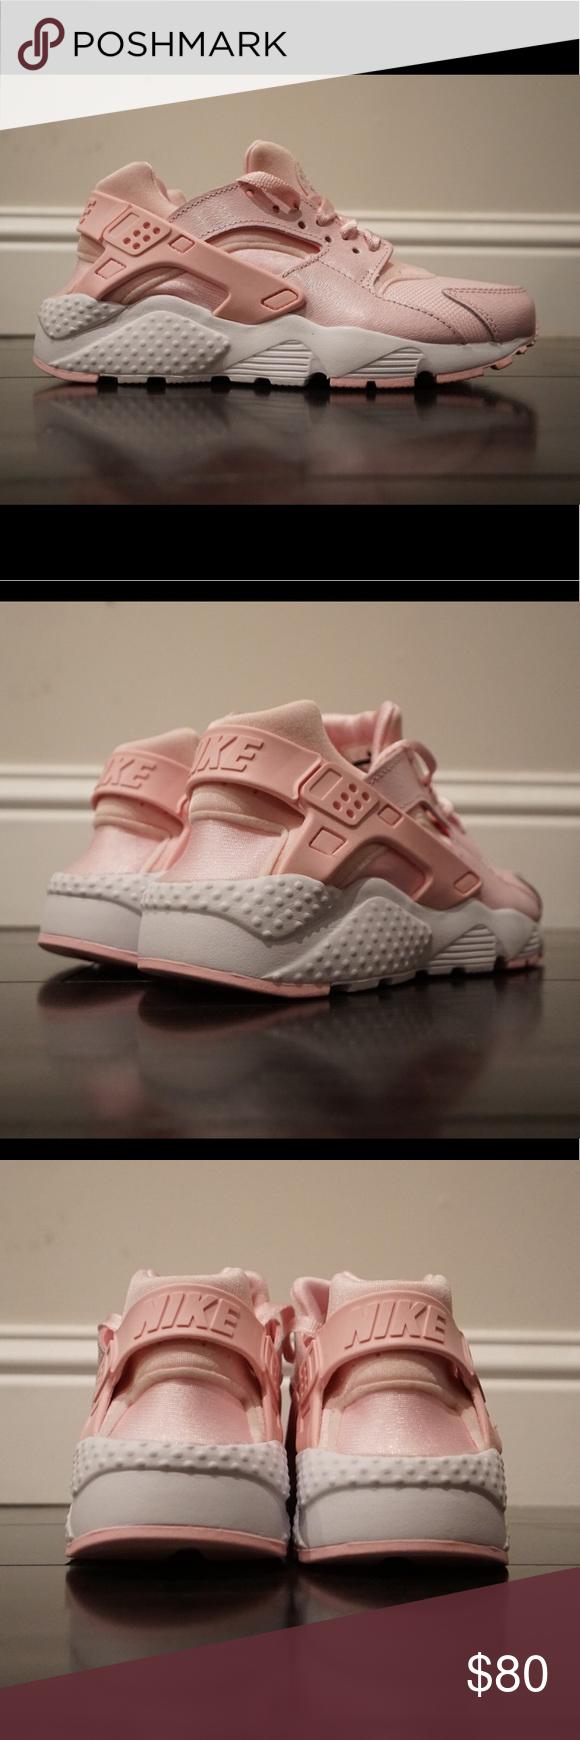 ba43cfc8bcd9 Nike Air Huarache Run SE Pink White 904538-600 Brand New with Box